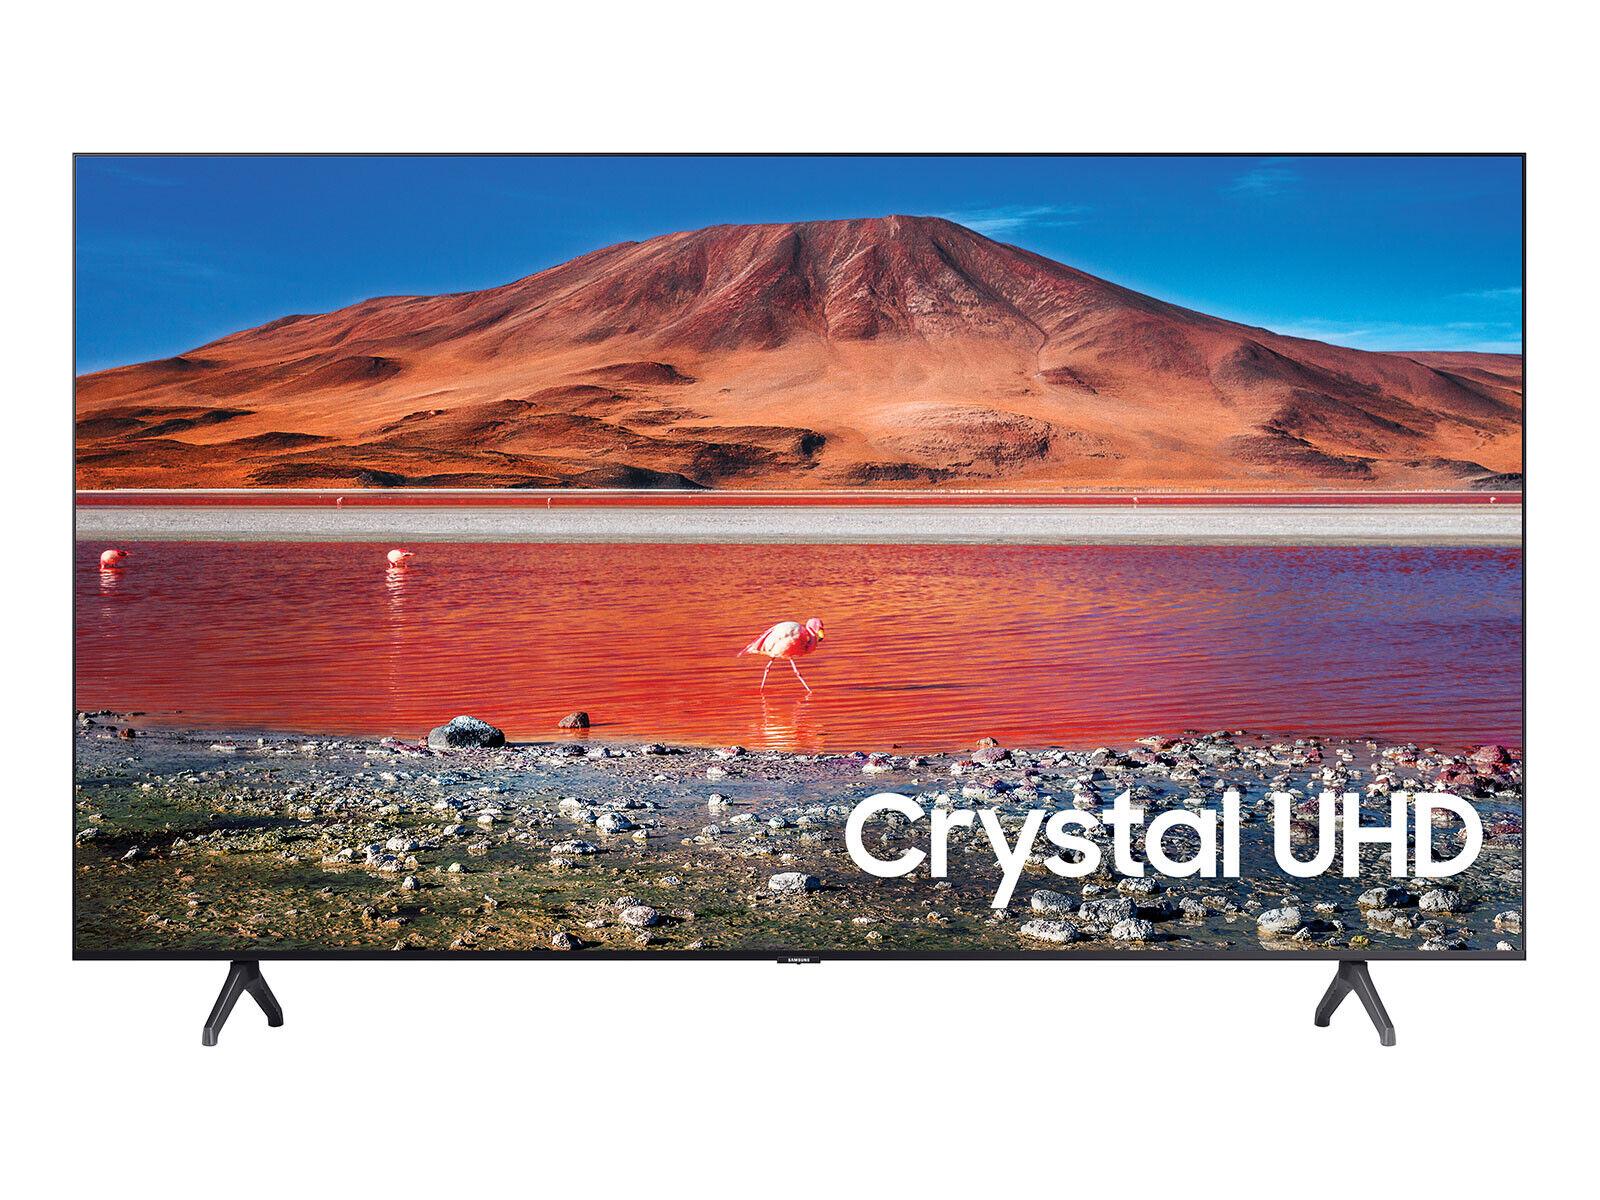 lockerq Samsung TU7000 70'' 4K LED Smart TV - Gray